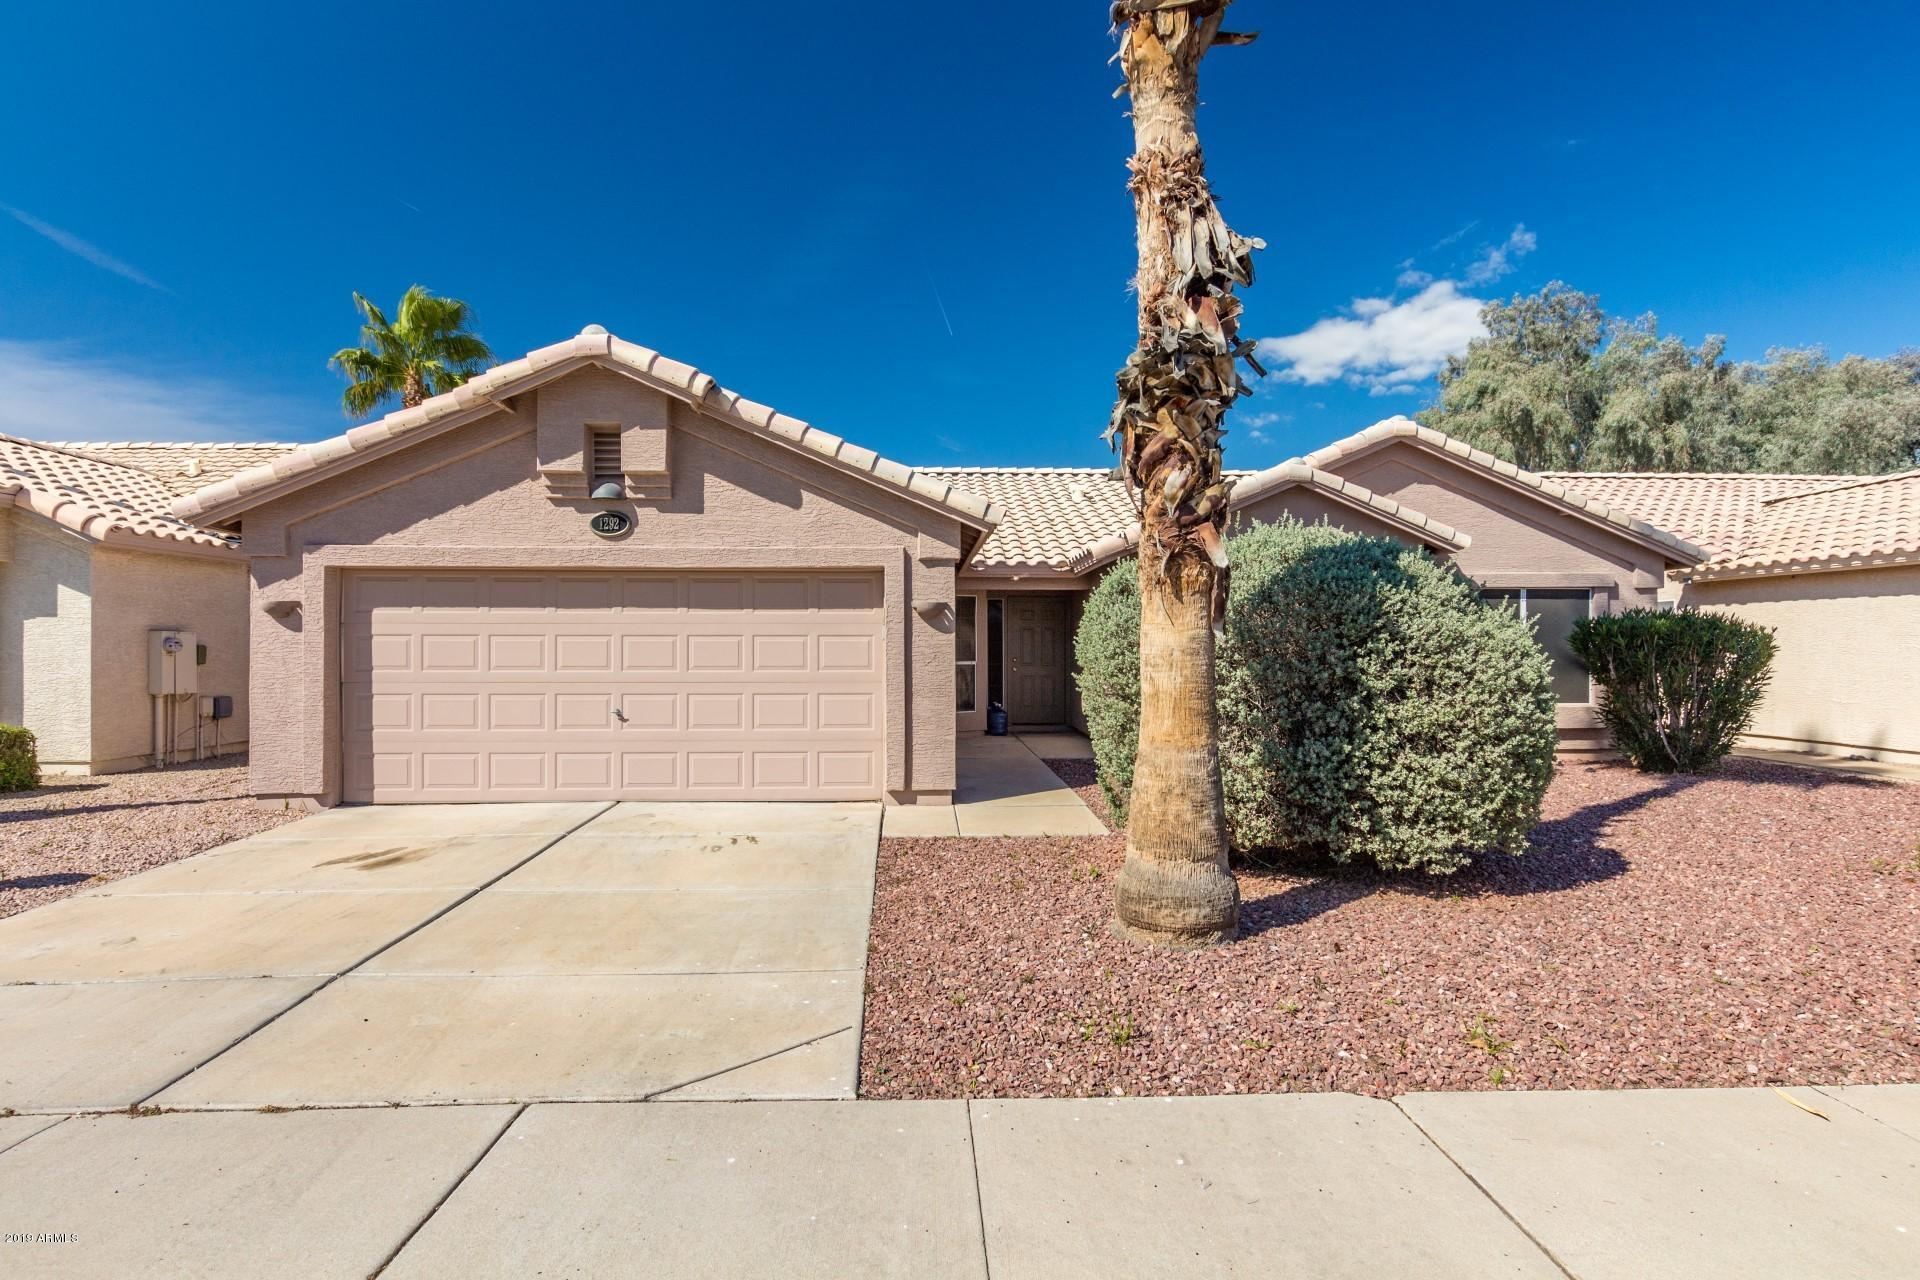 Photo of 1292 N BOGLE Avenue, Chandler, AZ 85225